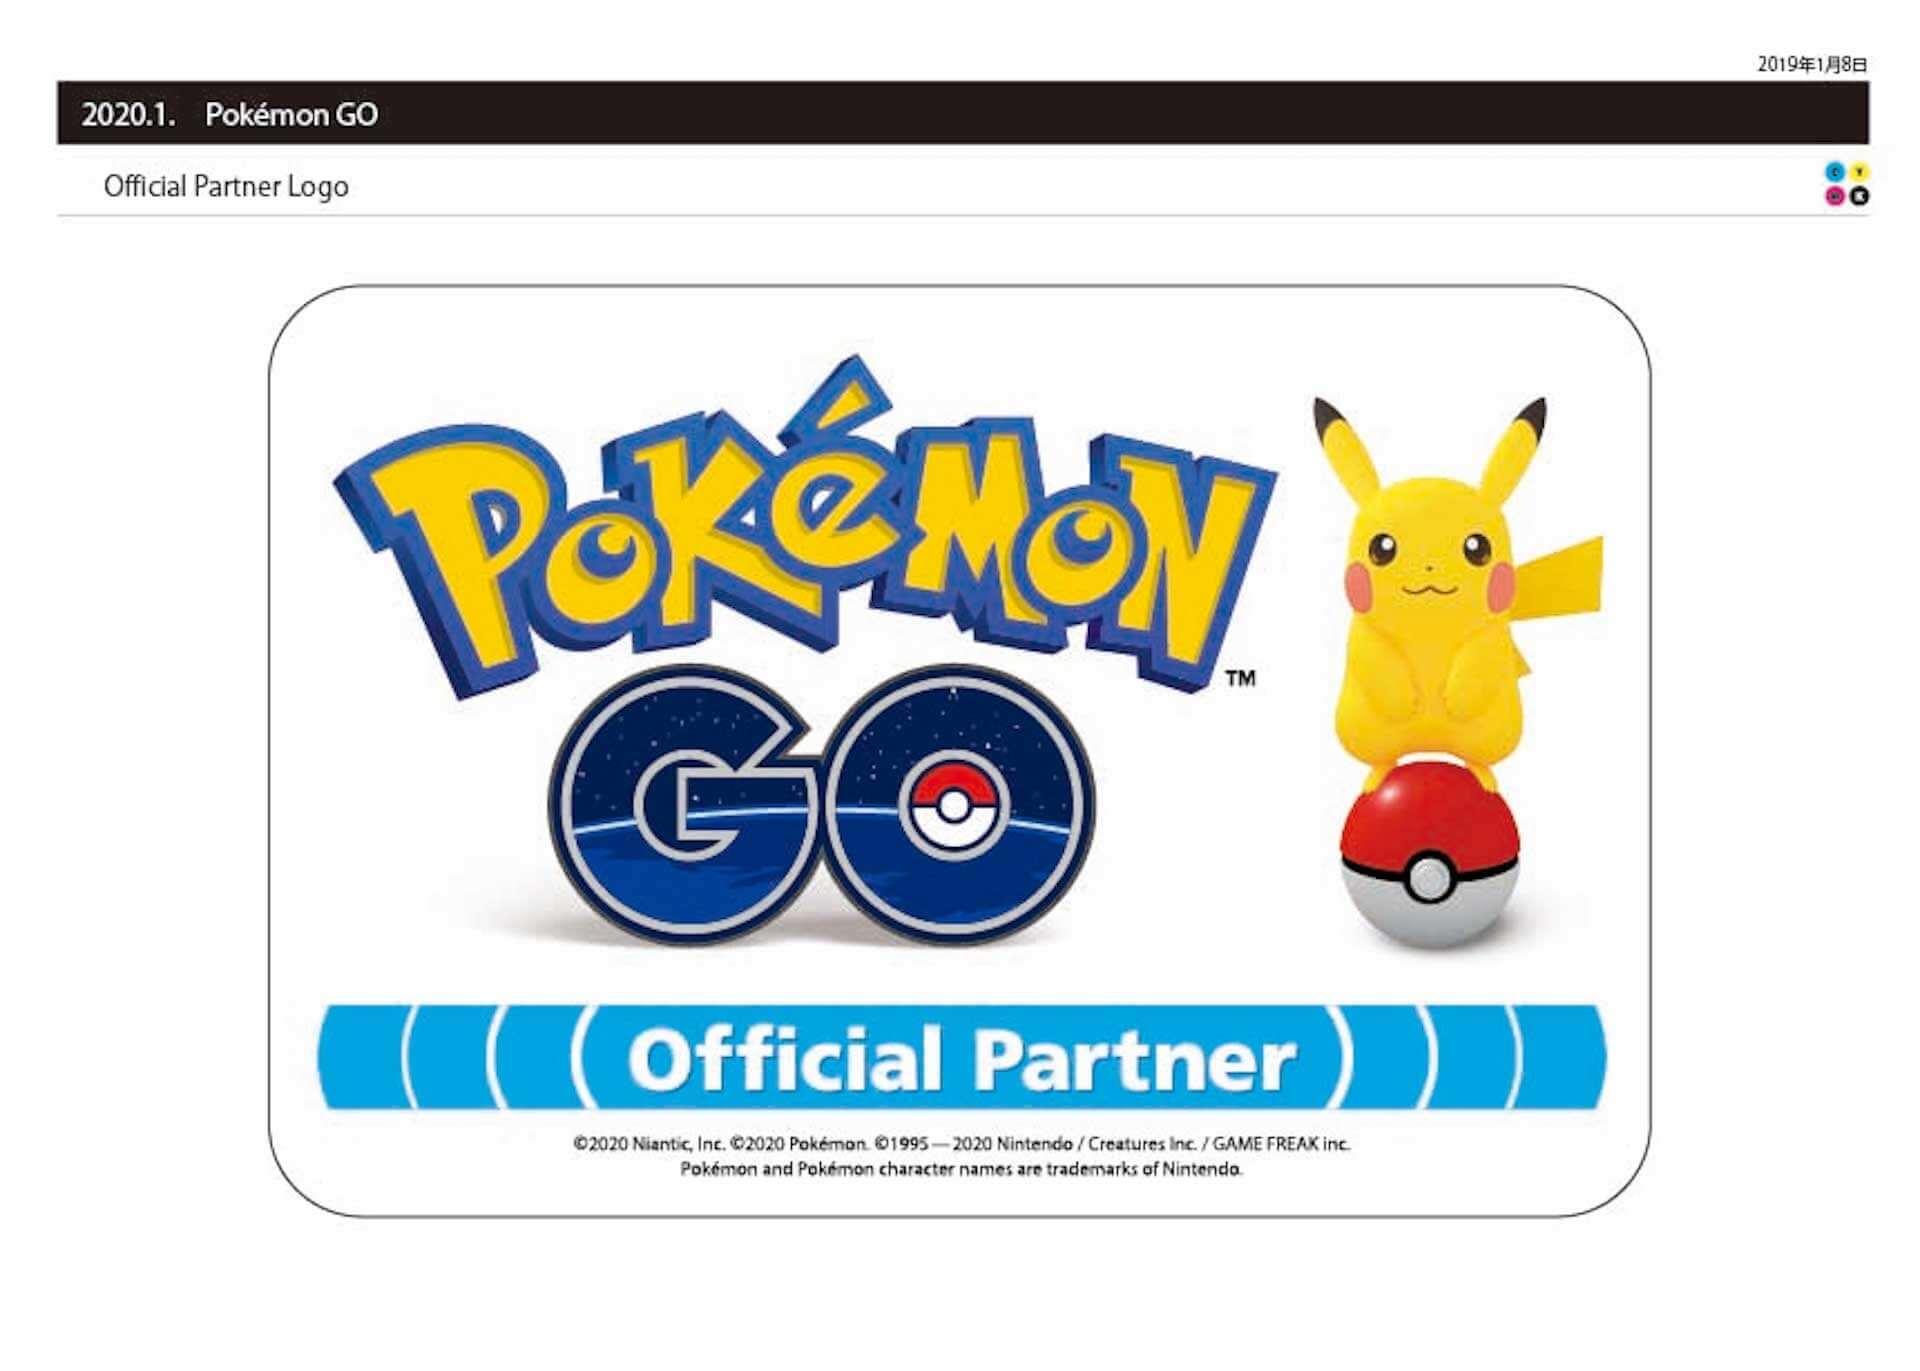 『Pokémon GO』に吉野家がポケストップ&ジムとして登場!ゲーム内では10%引きクーポンも配布 tech201020_yoshinoya-pokemongo_4-1920x1371